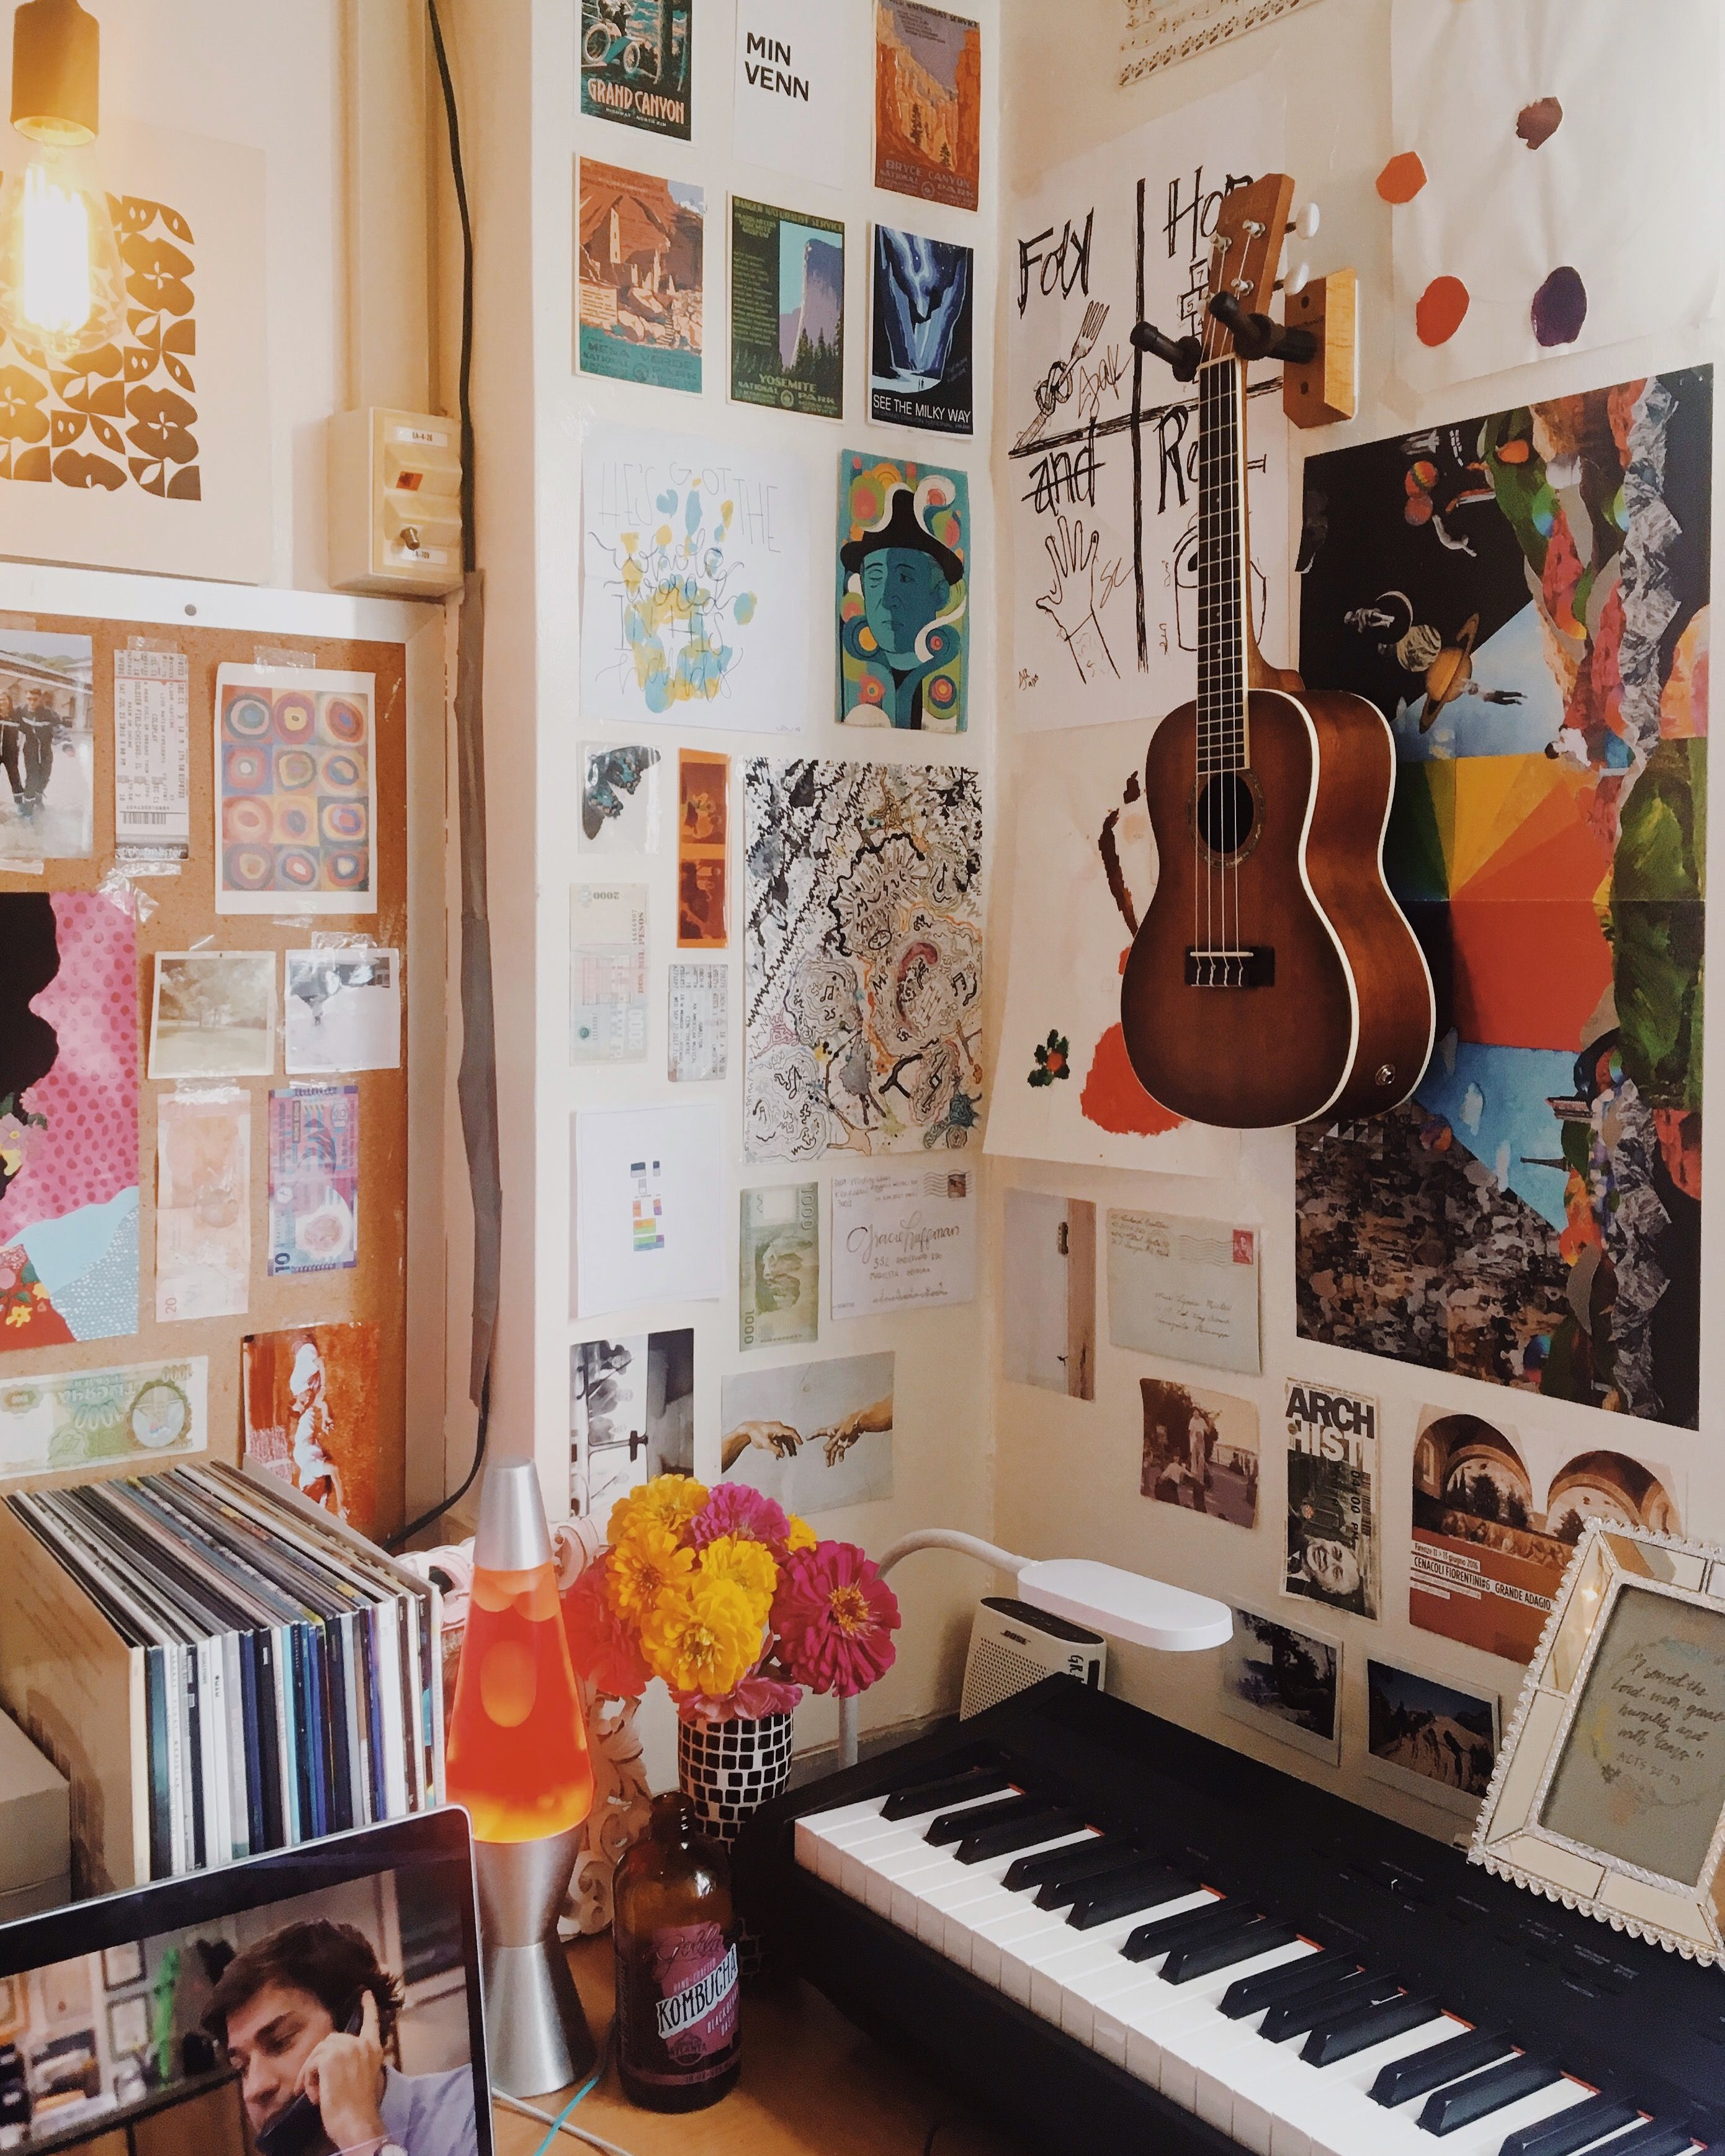 Vinyles Music Musique Vintage Salongreen Platine